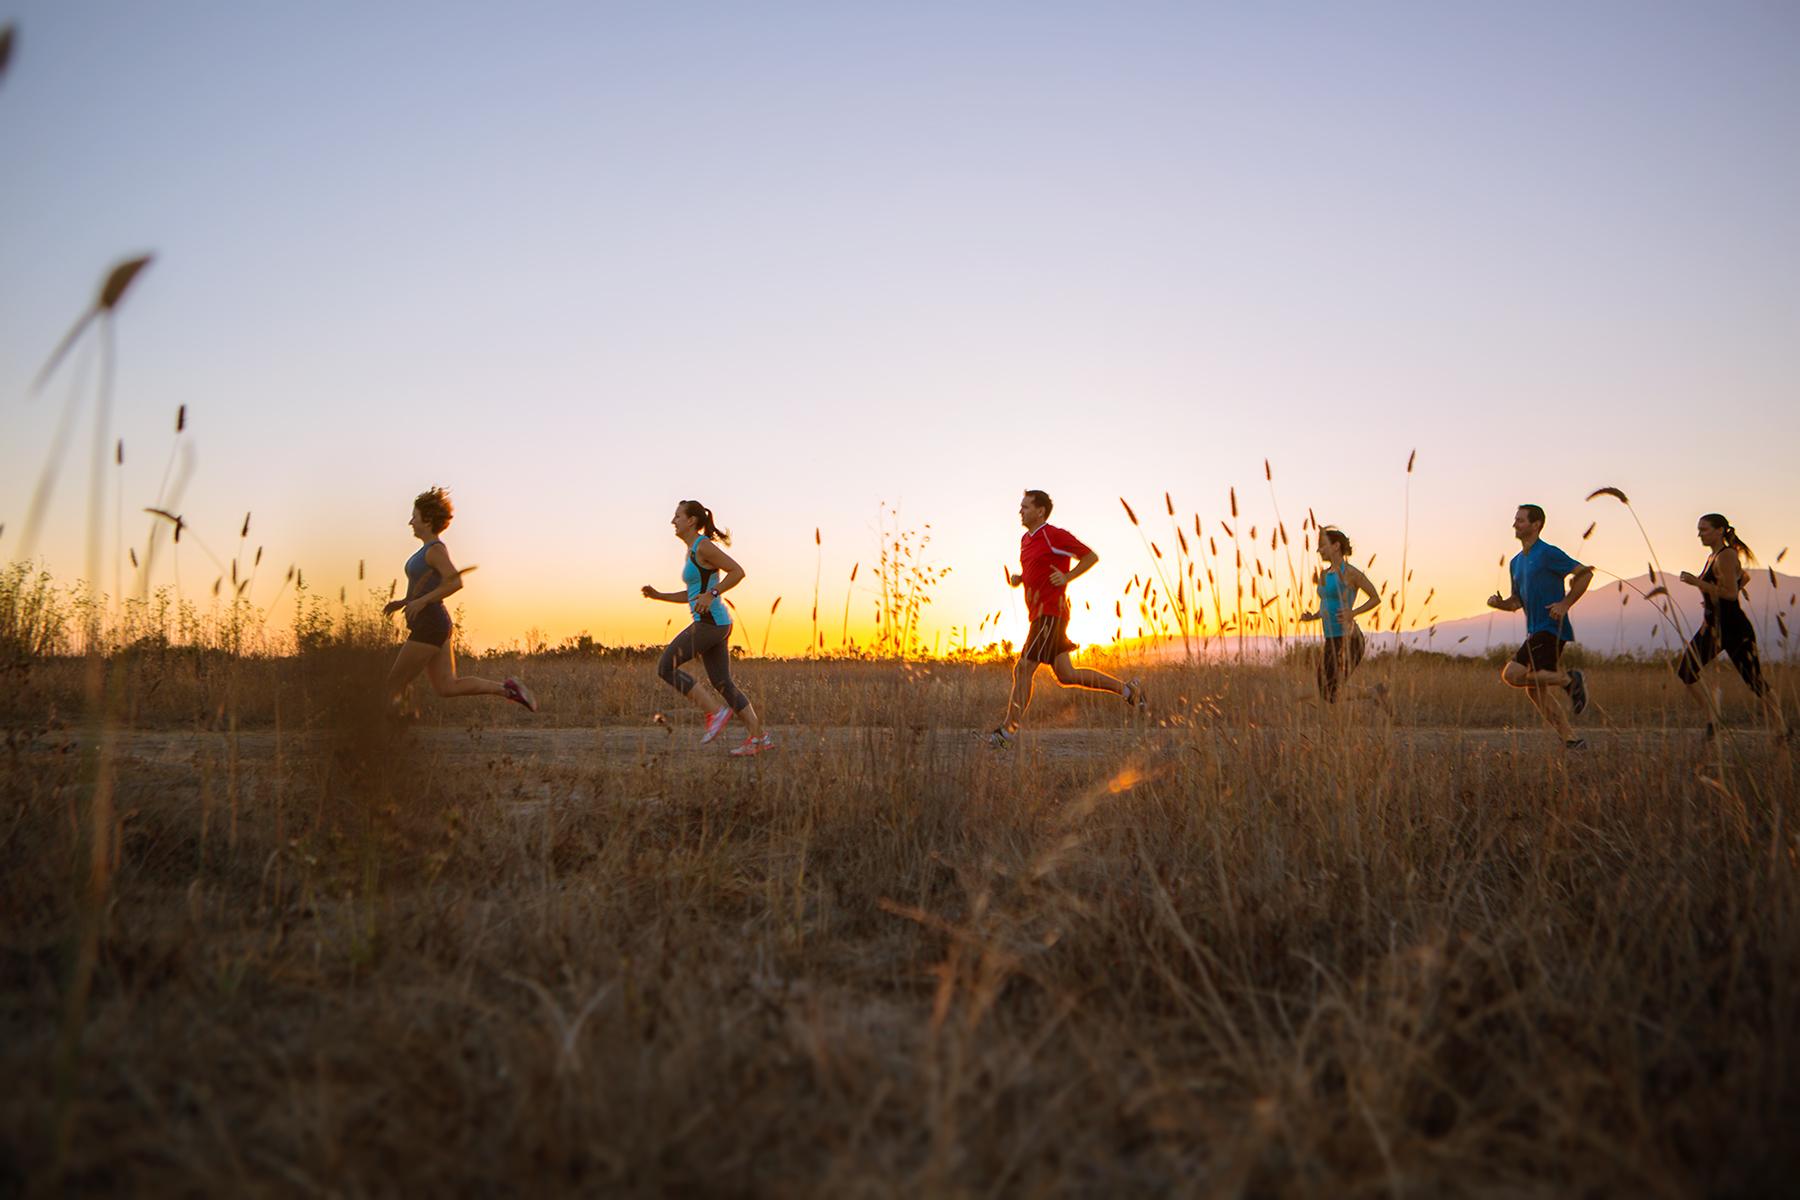 Runners in the sunset - Santa Barbara, California